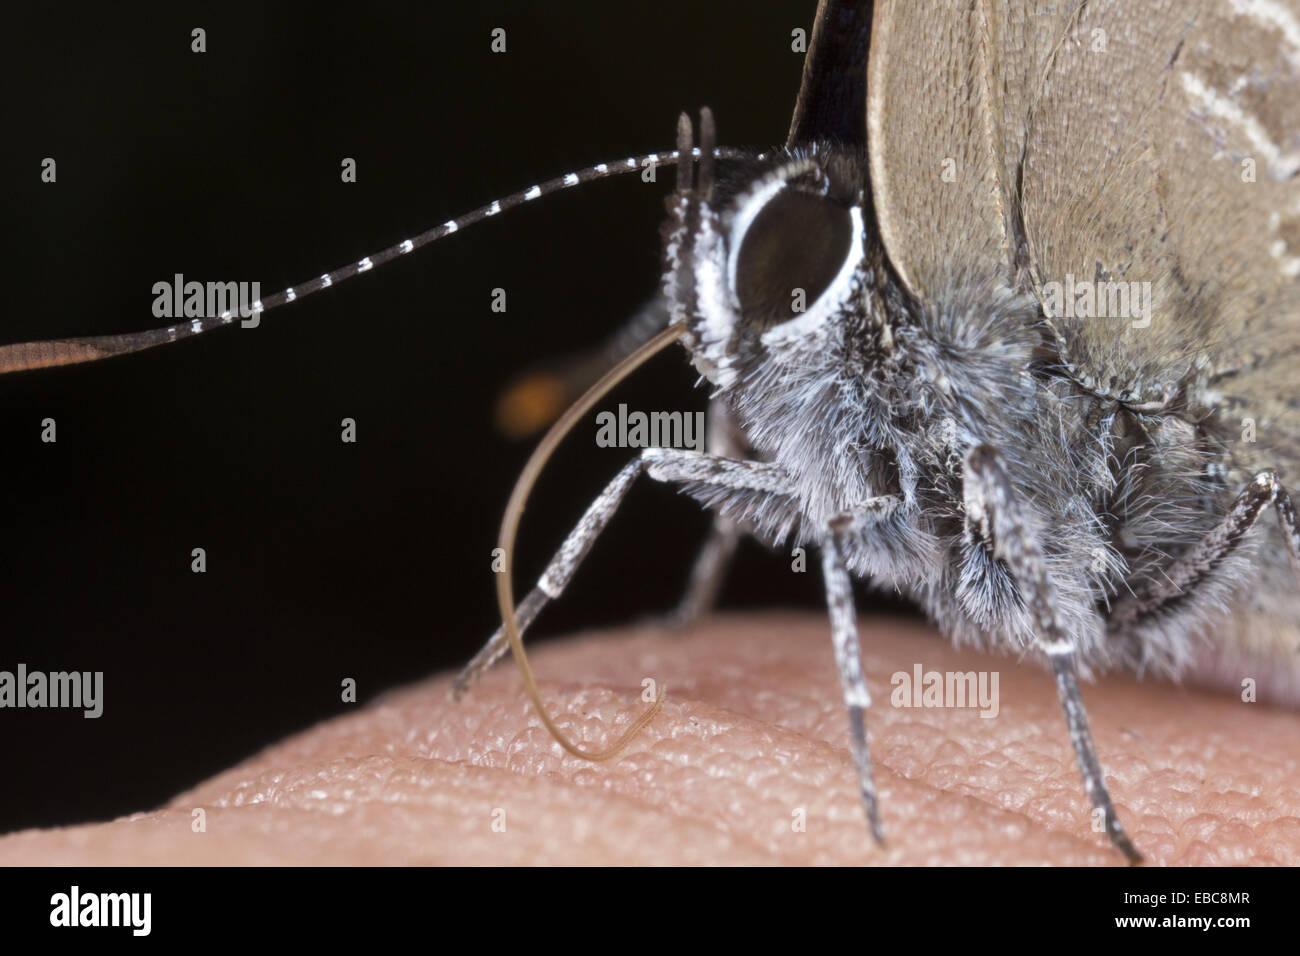 Butterfly sucking on sweat from hand. Image taken at Kampung Skudup Sarawak Malaysia. - Stock Image